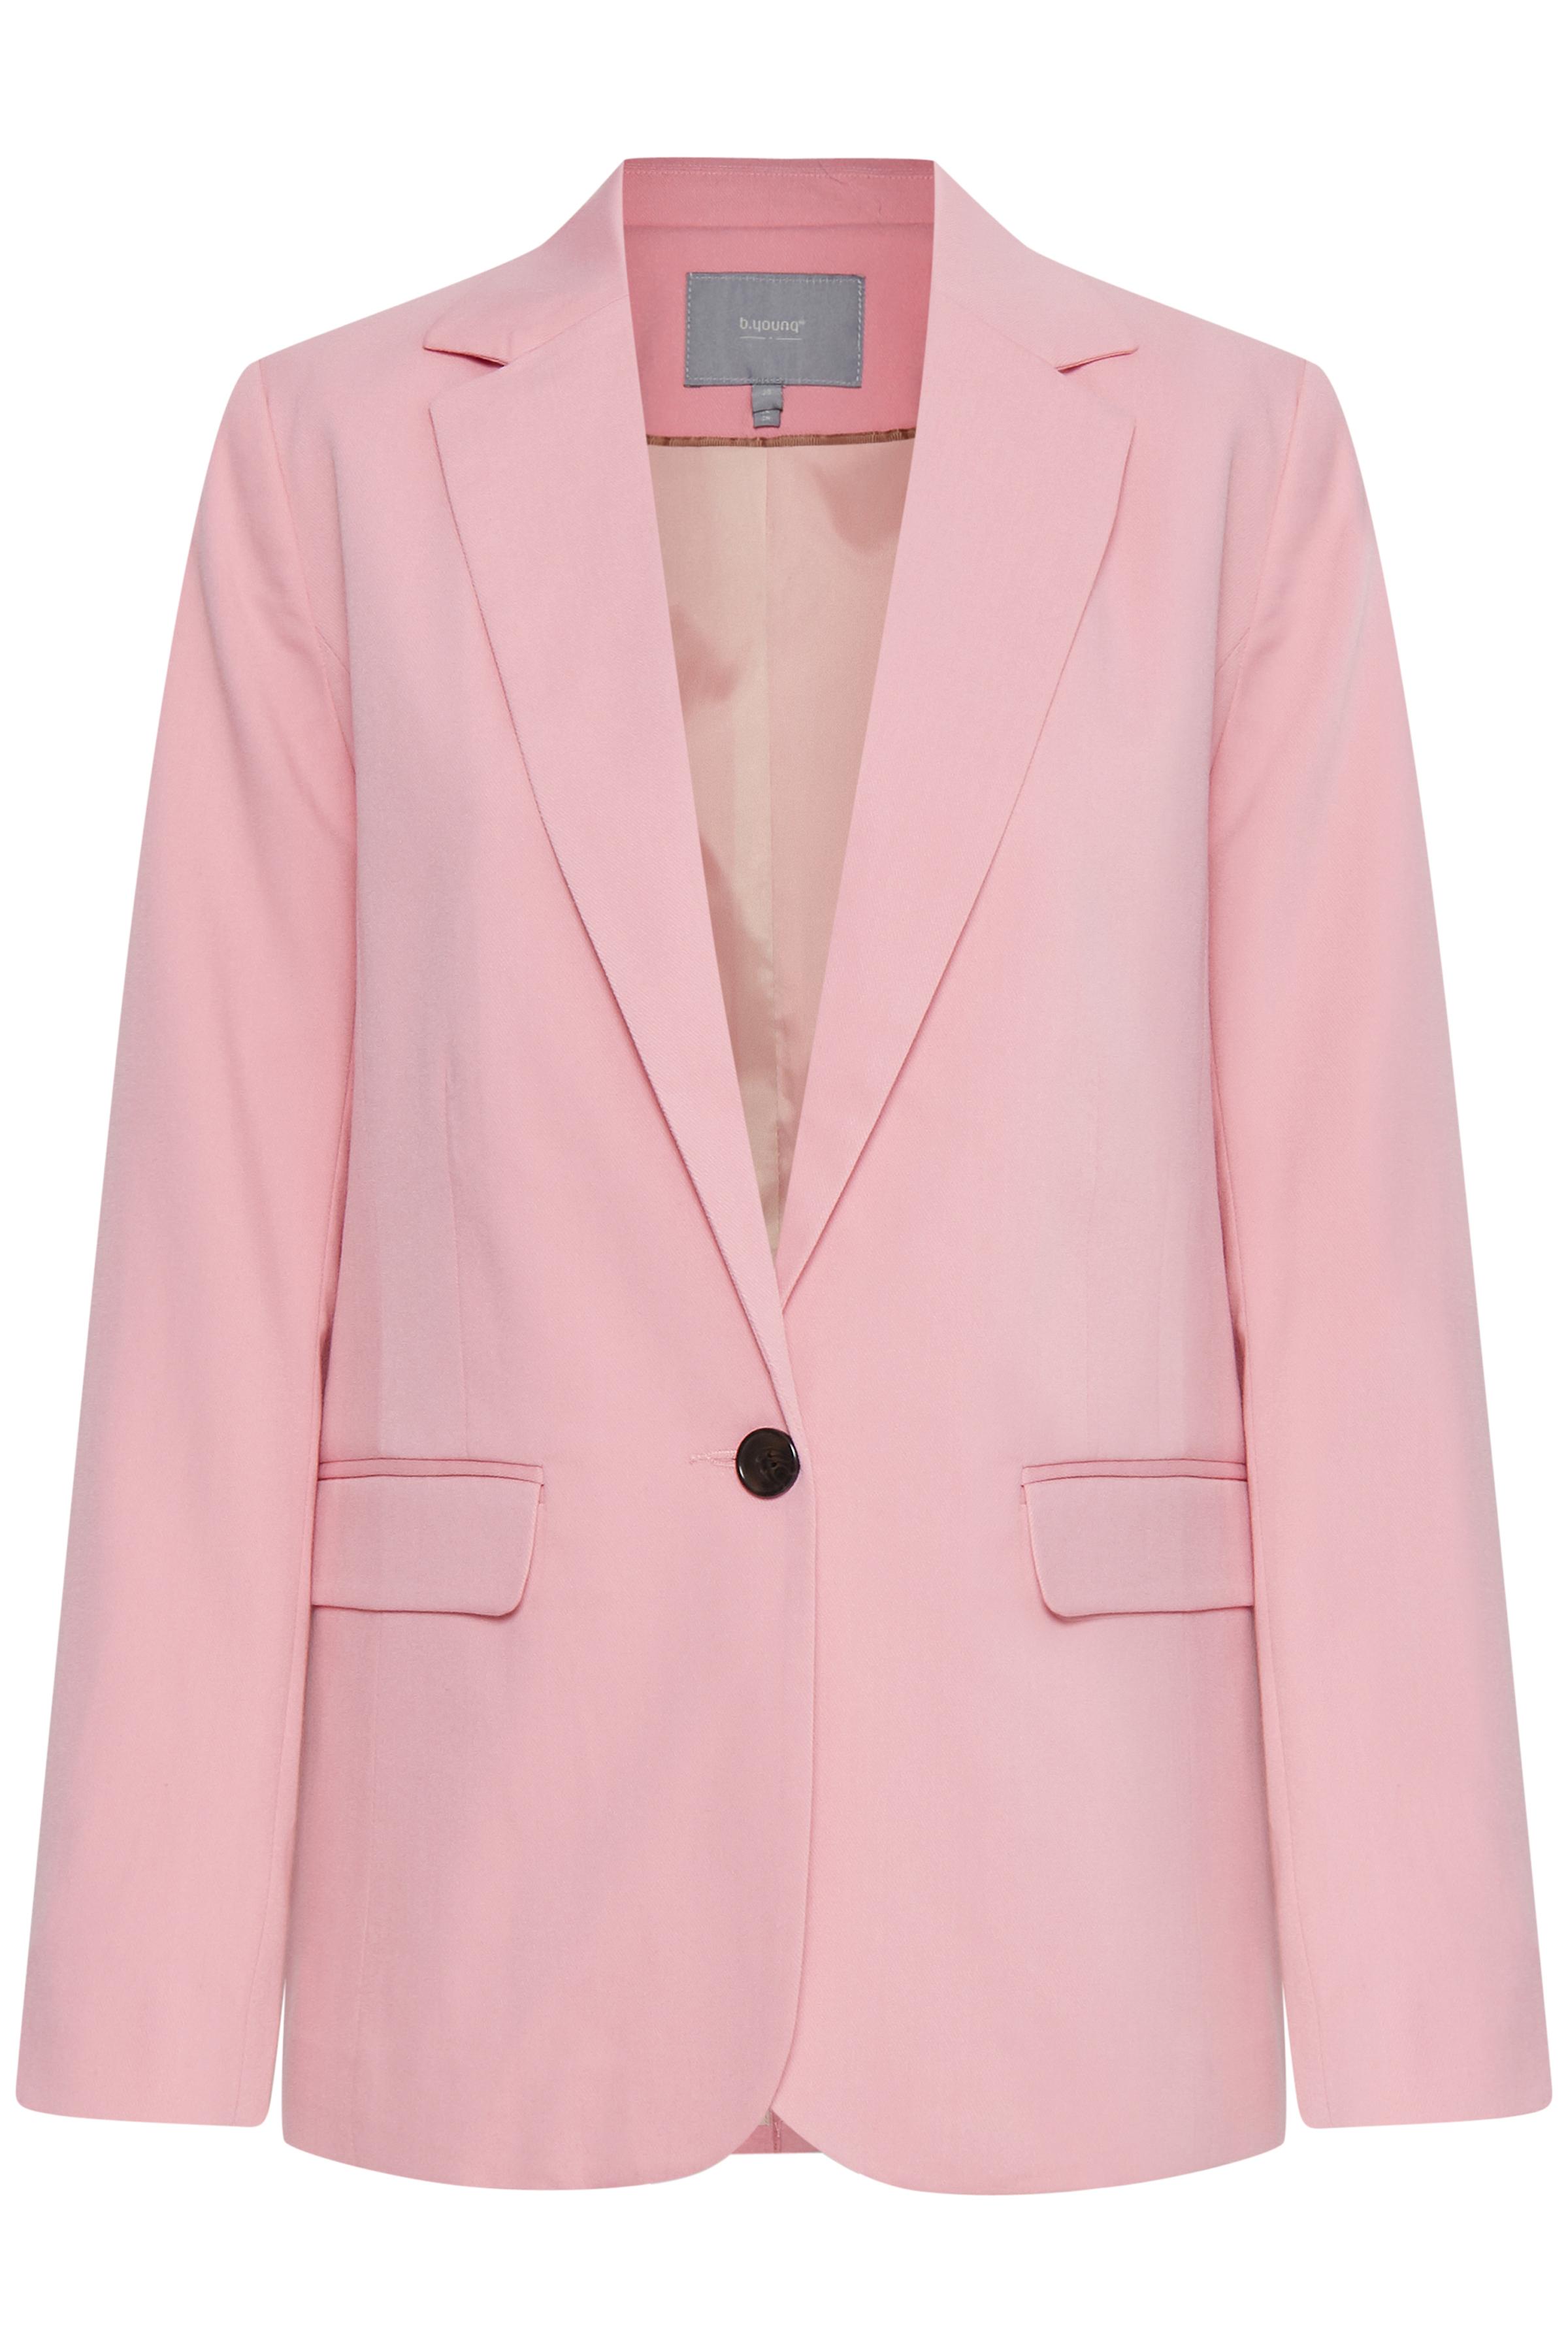 Image of b.young Dame Blazer - Sorbet Pink